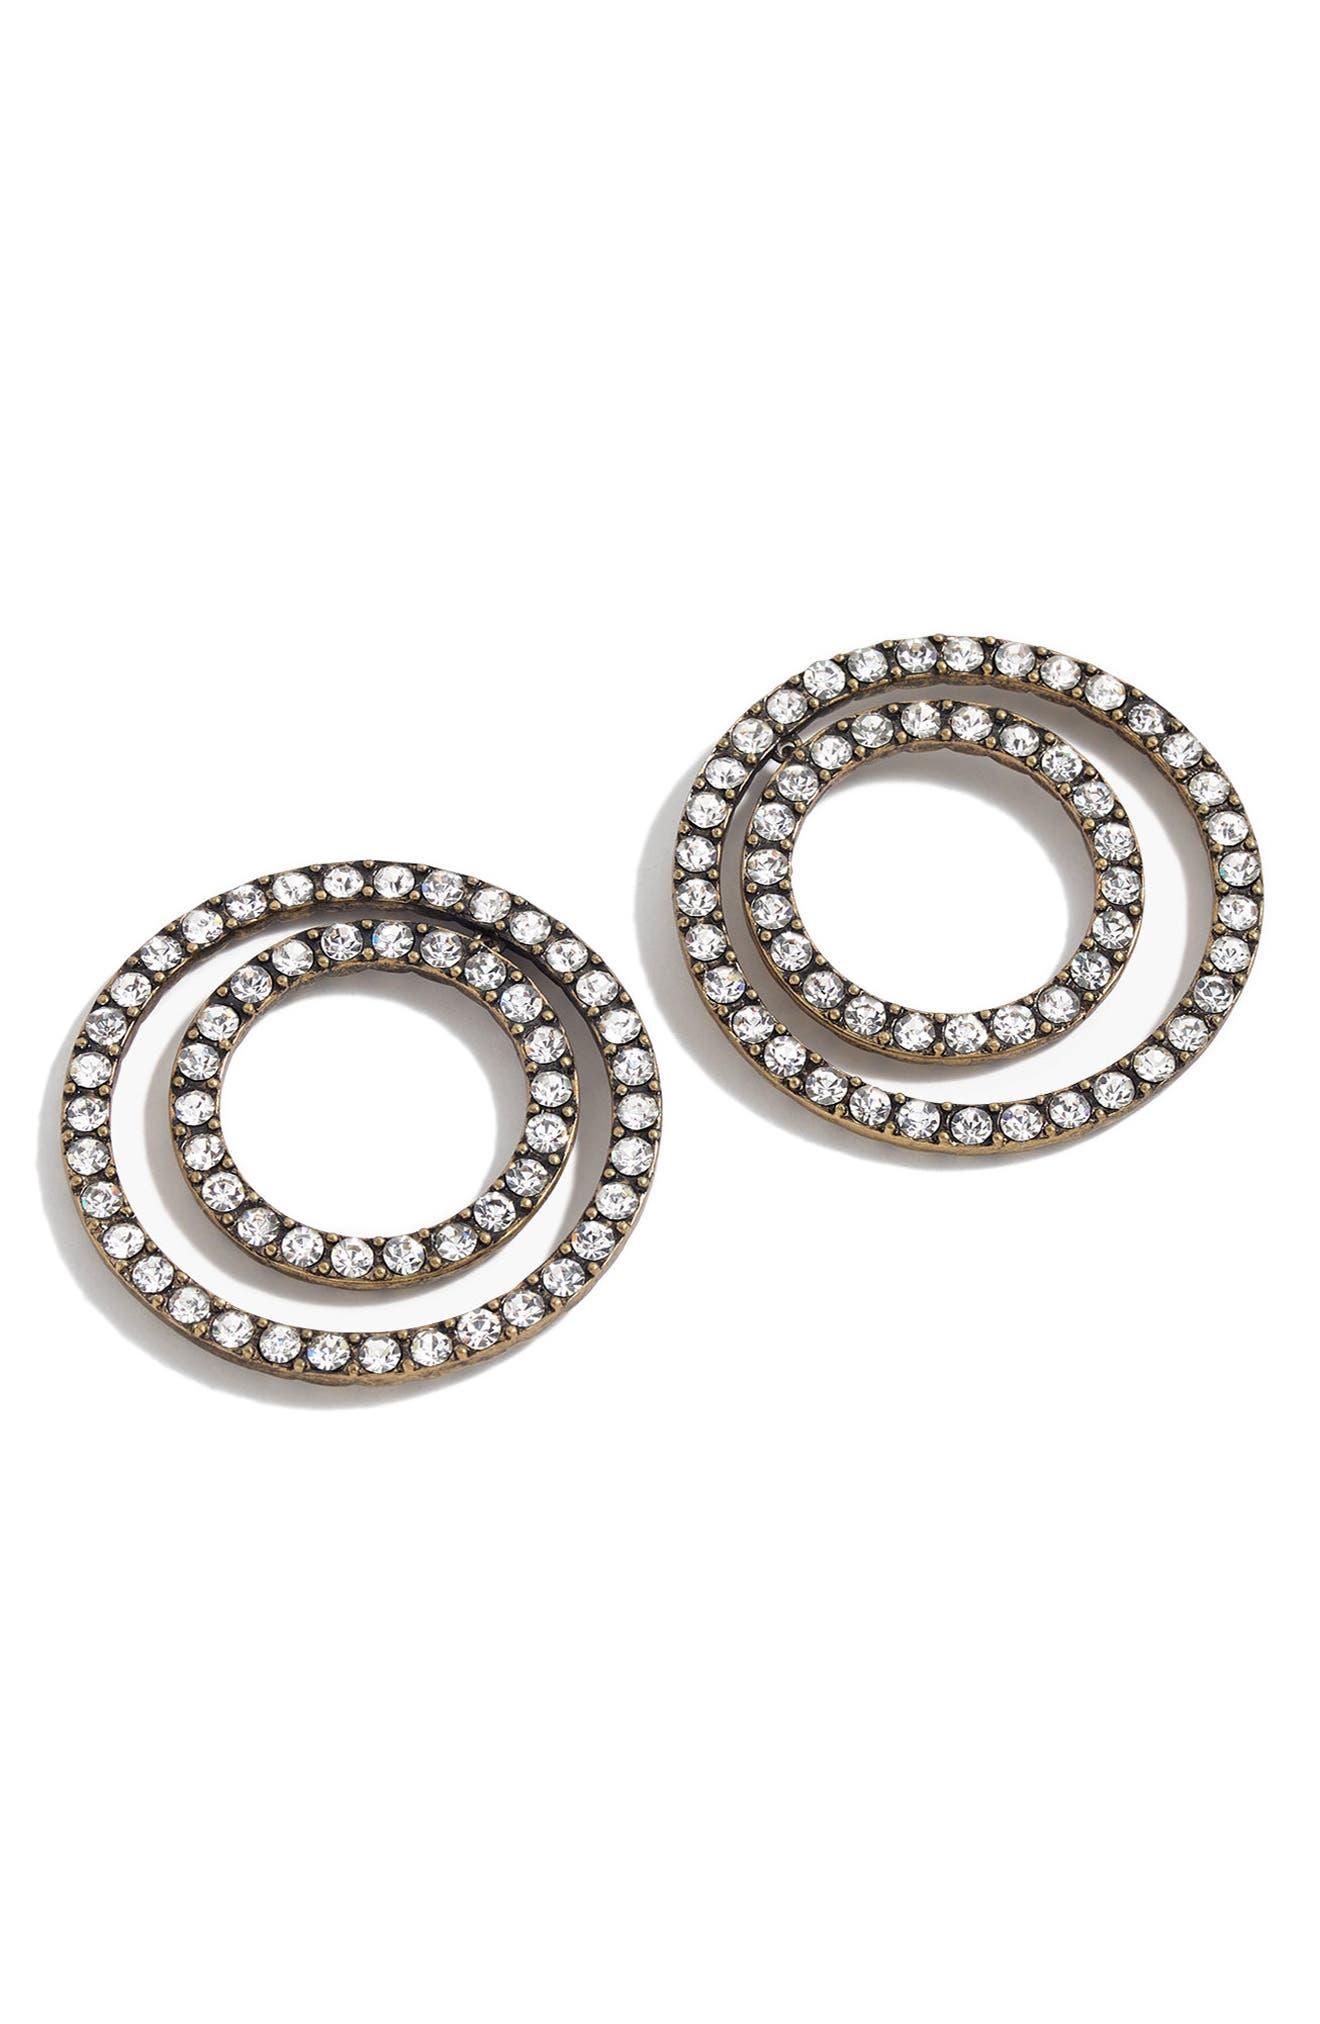 J.Crew Sparkle Double Circle Earrings,                         Main,                         color, Heather Ash